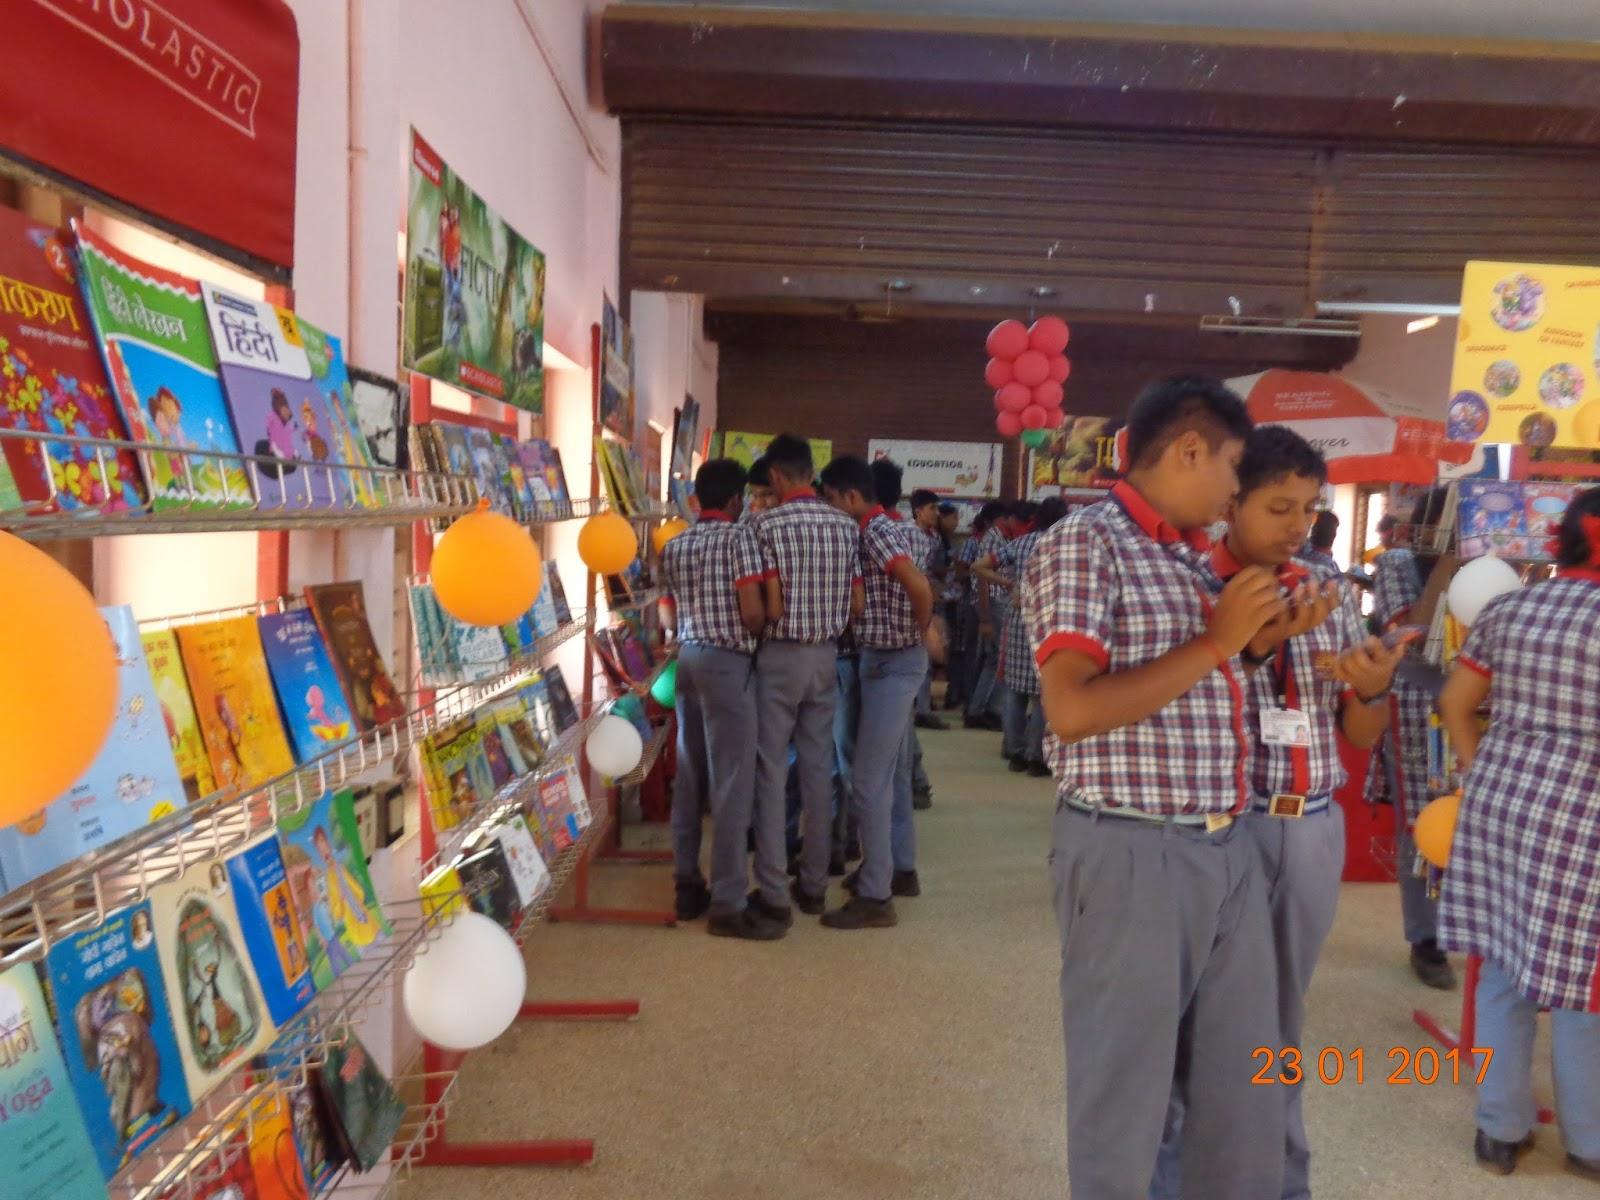 Kendriya Vidyalaya Ottapalam Library Book Exhibition In